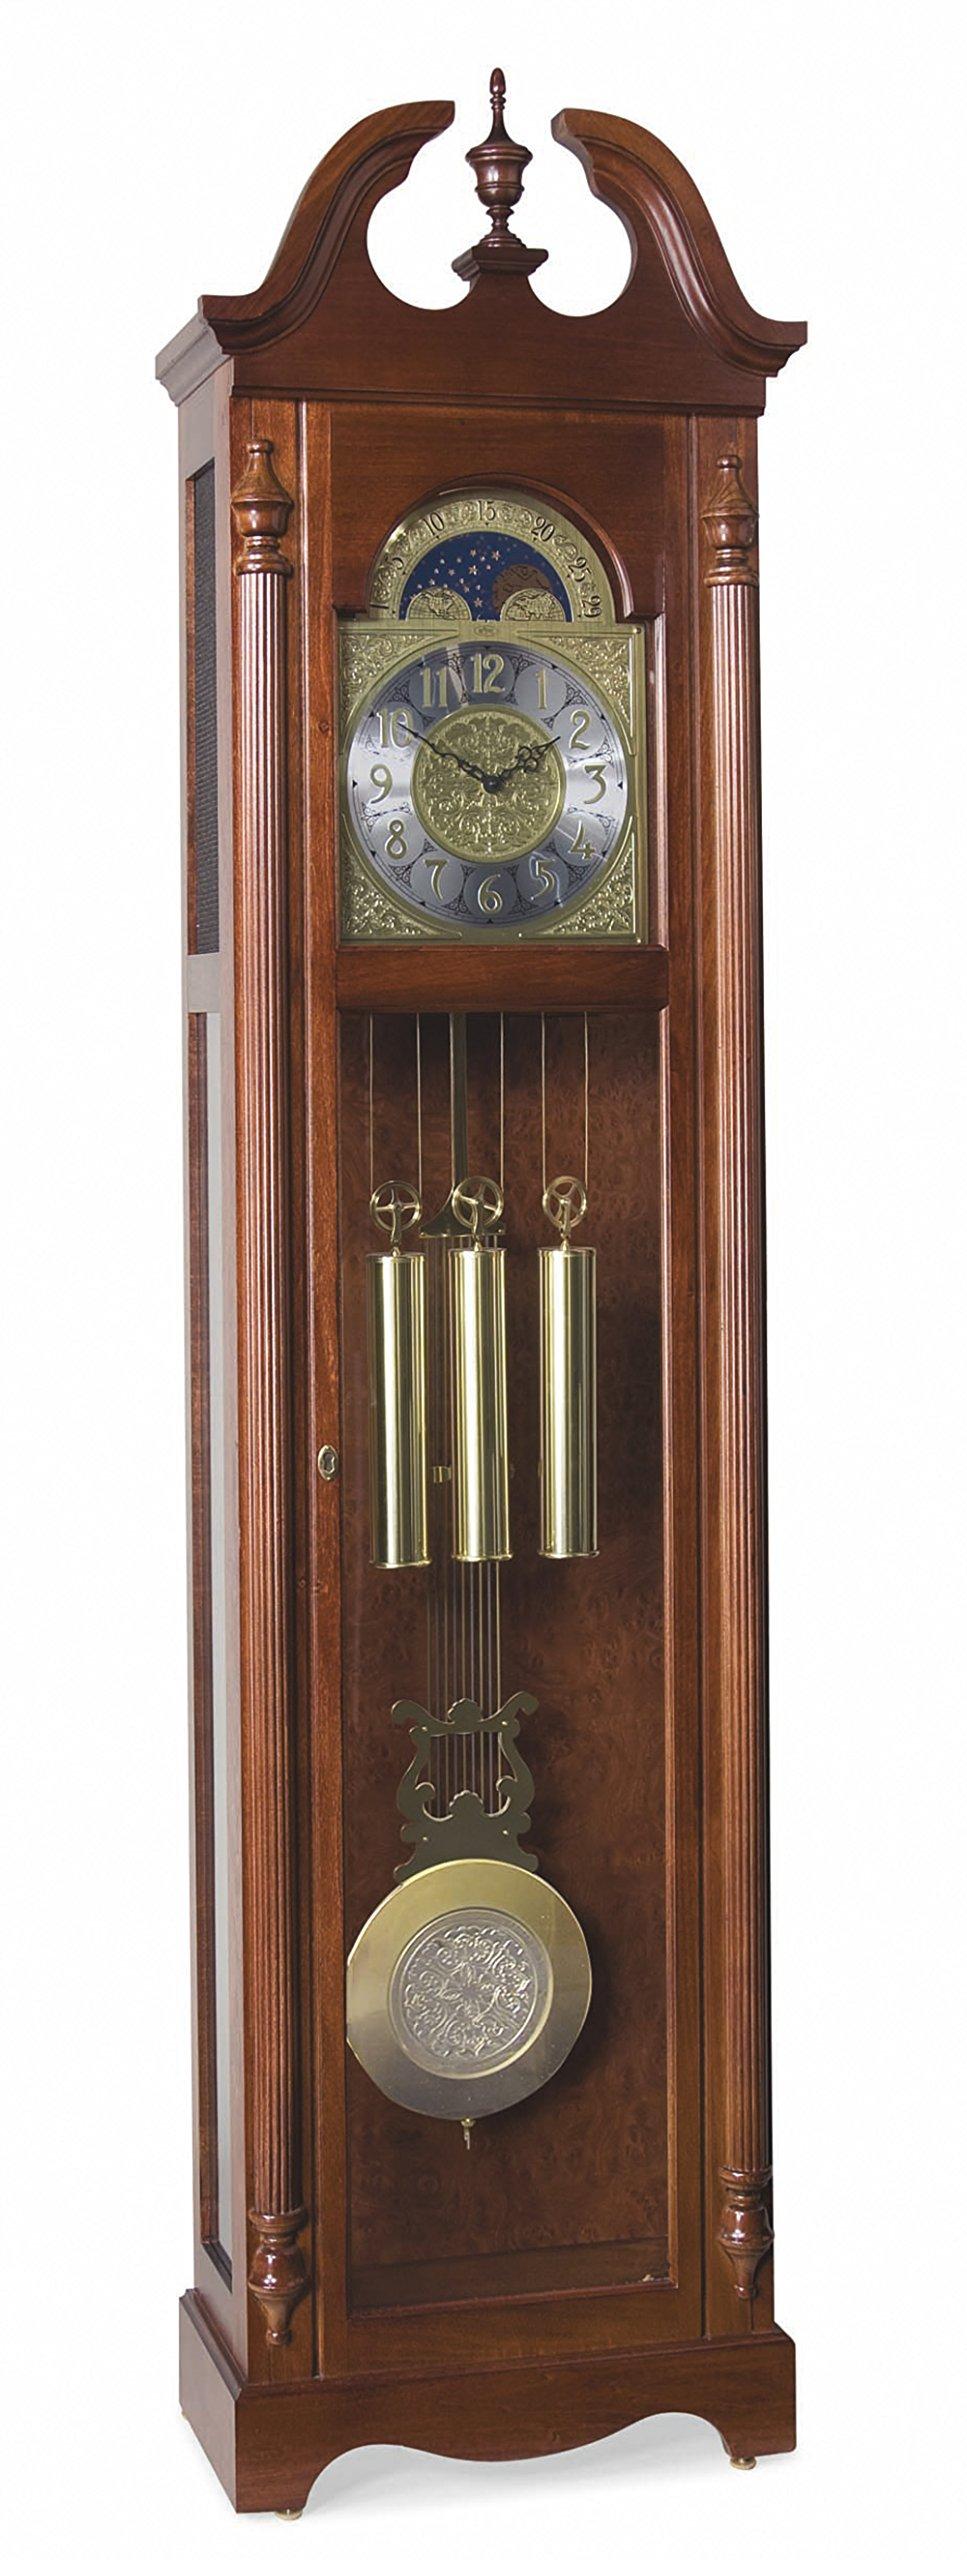 Ridgeway 2504 Lynchburg Grandfather Clock, Glen Arbor Cherry by Ridgeway